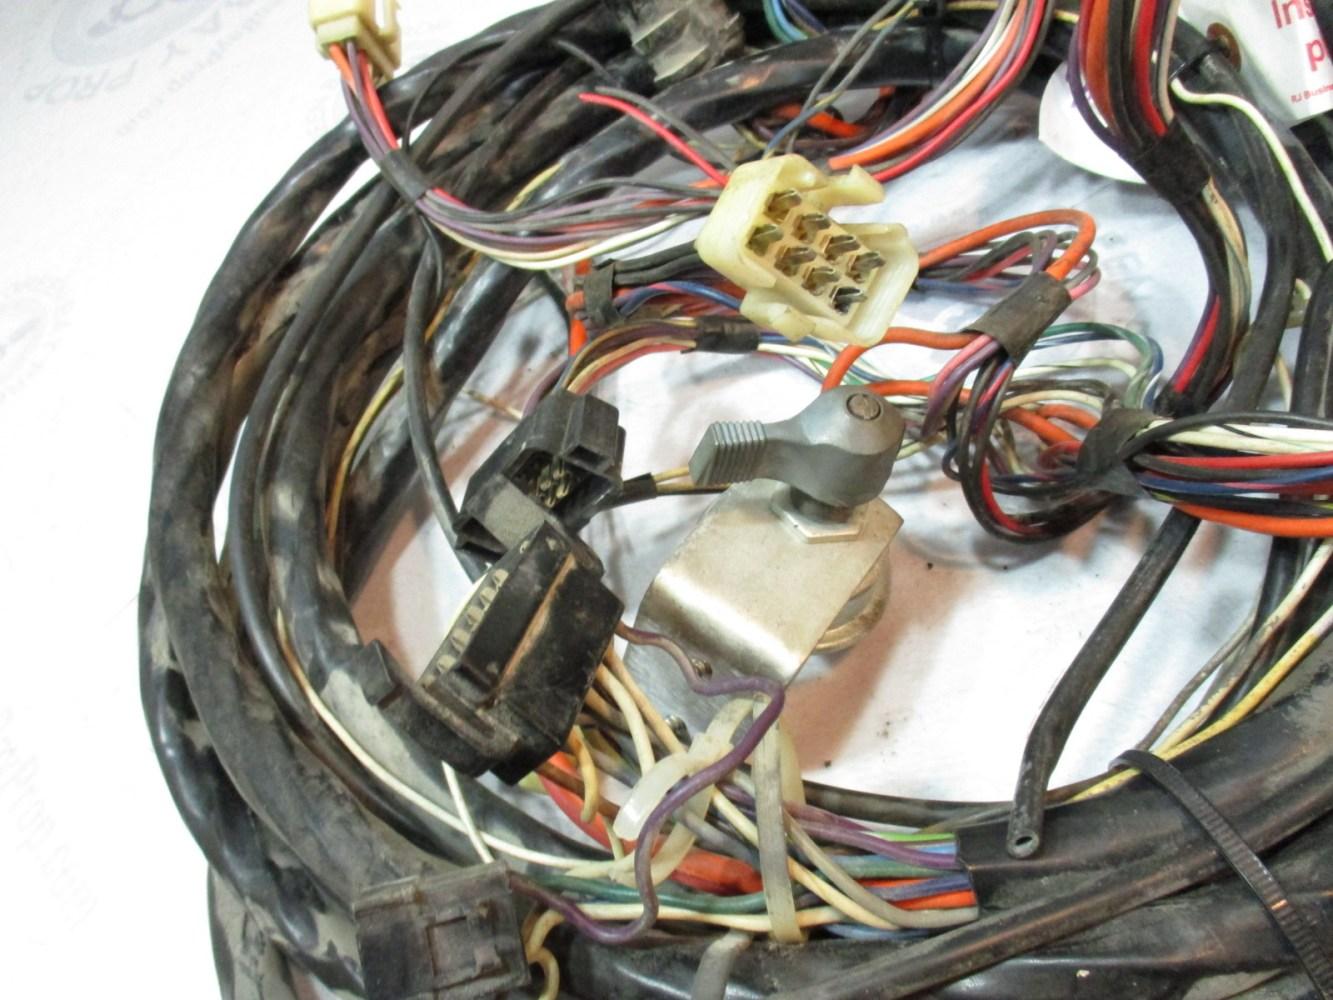 medium resolution of  omc stringer v8 1971 engine to dash 22 boat wire harness